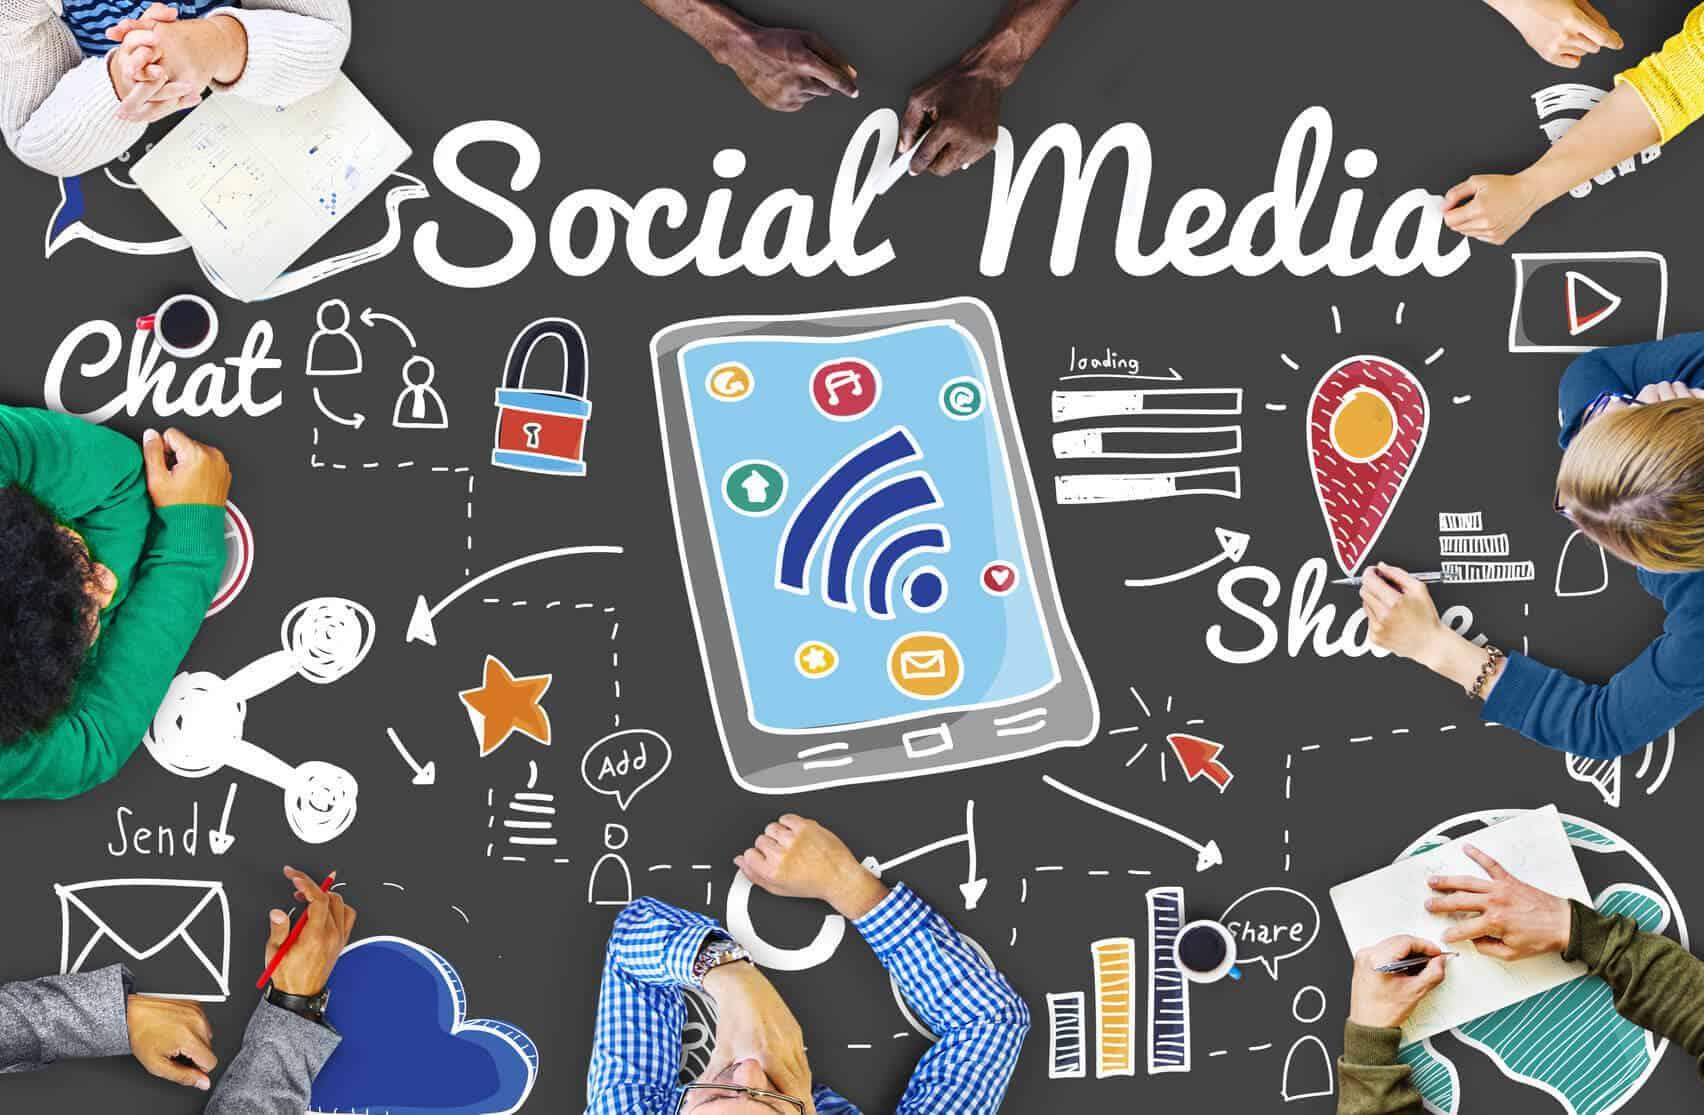 Die richtige Social Media-Strategie im Content Marketing ©Fotolia 2016/Rawpixel.com